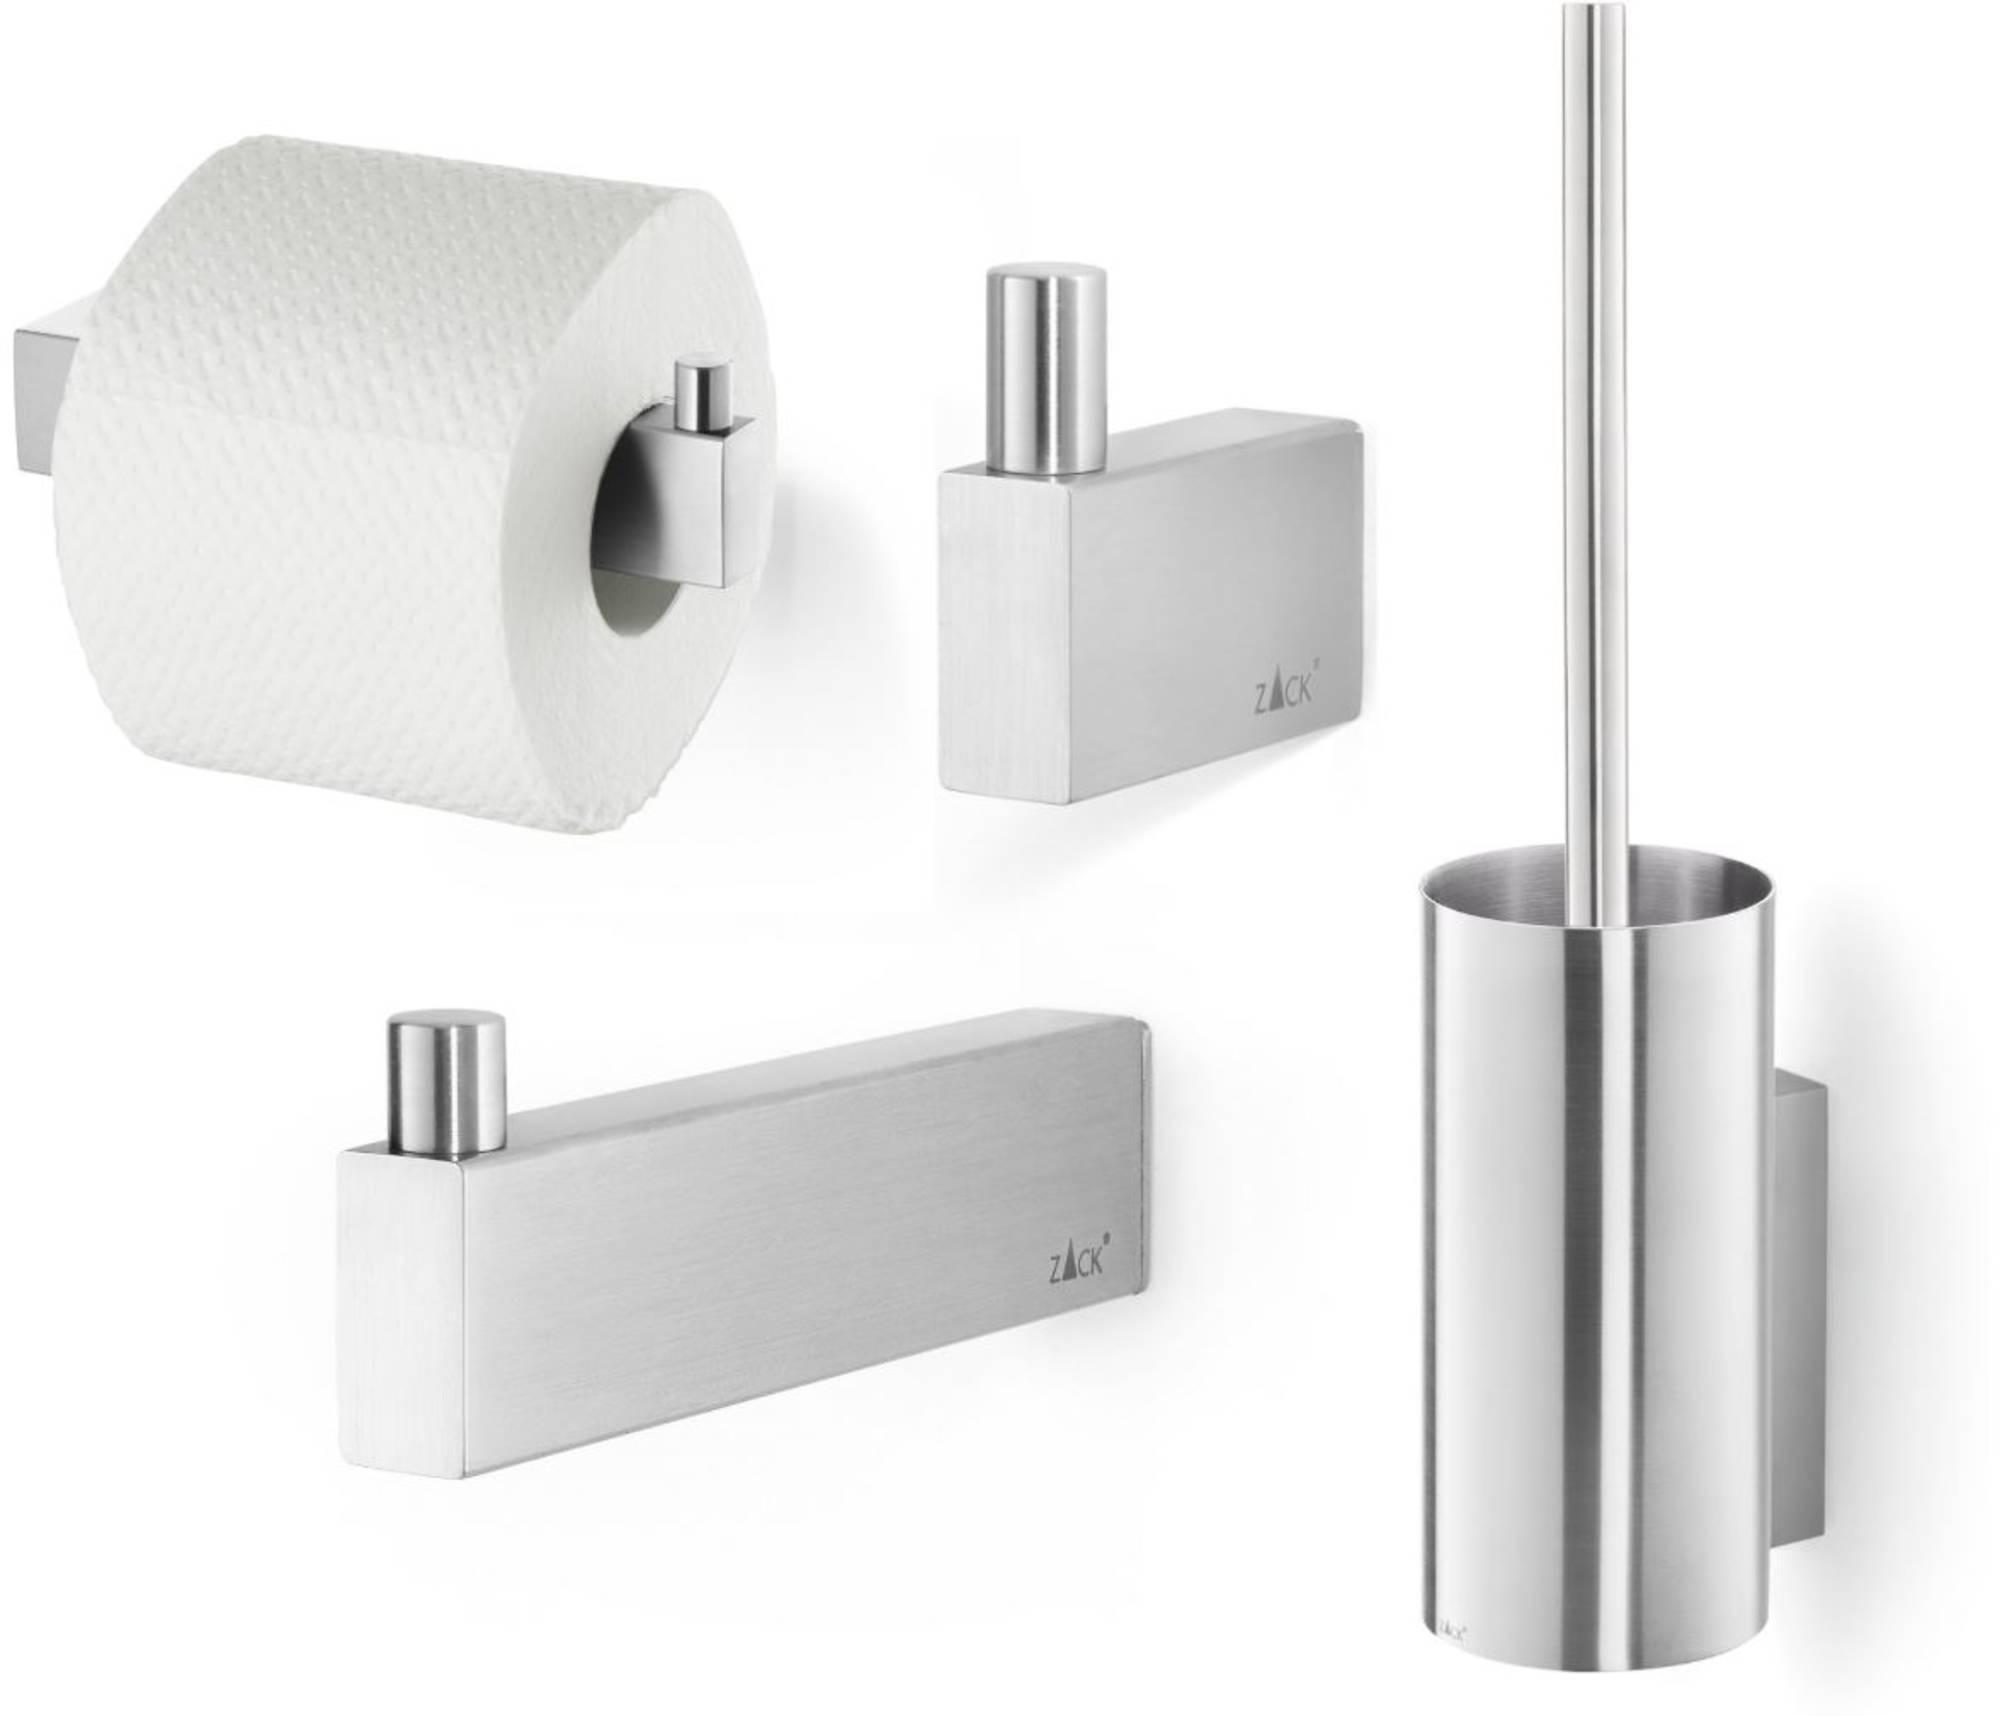 ZACK Linea toilet accessoireset 4-in-1 RVS Mat